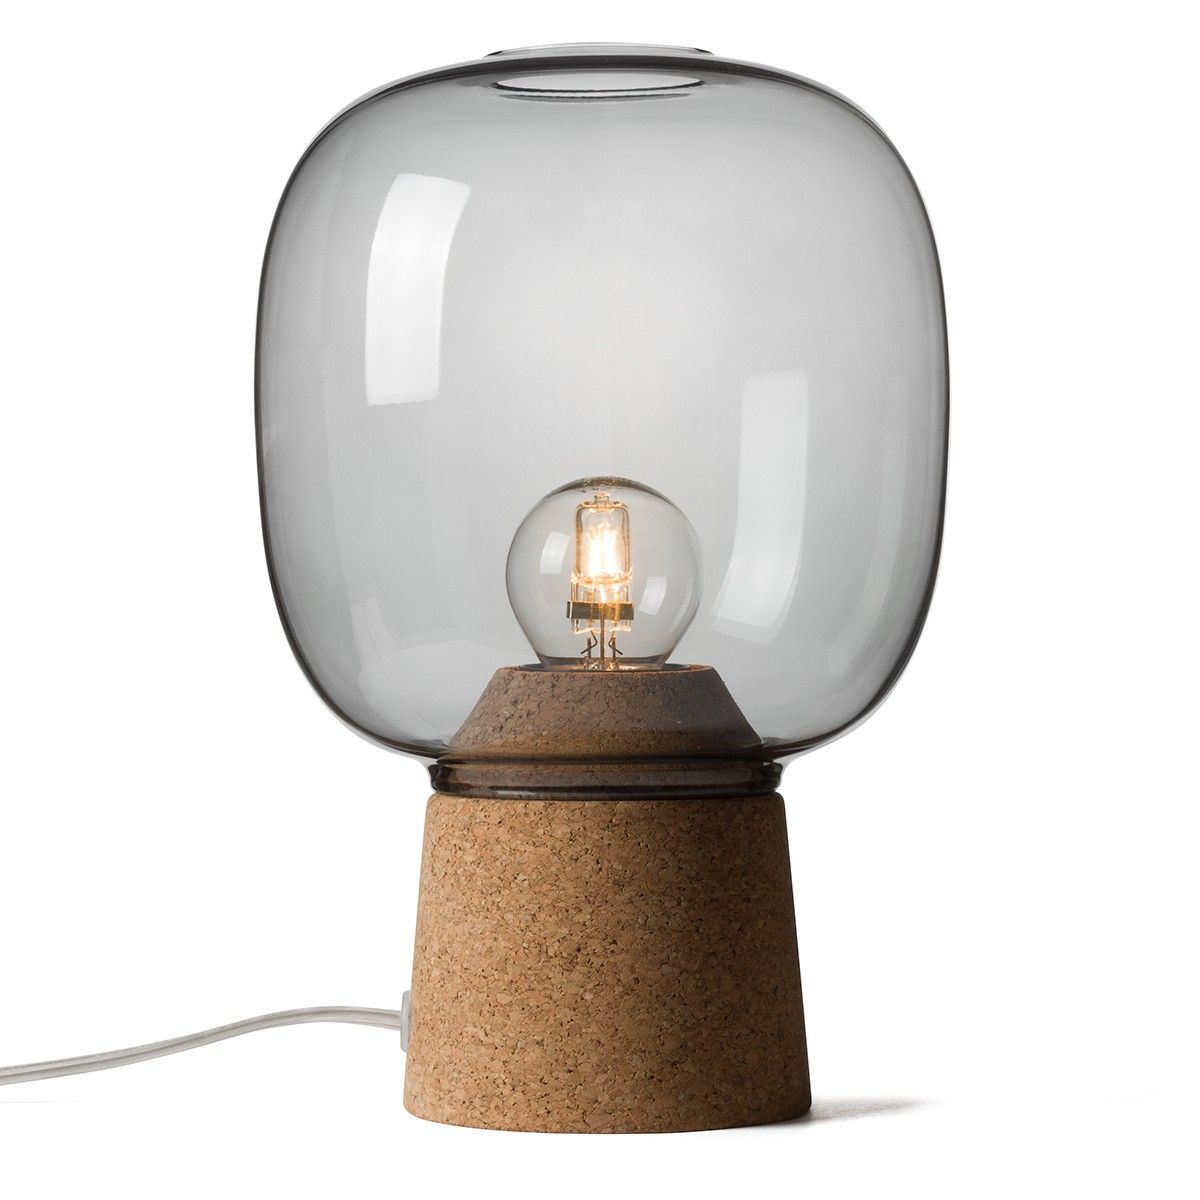 La Lampe A Poser Design En Verre Picia Du Designer Italien Enrico